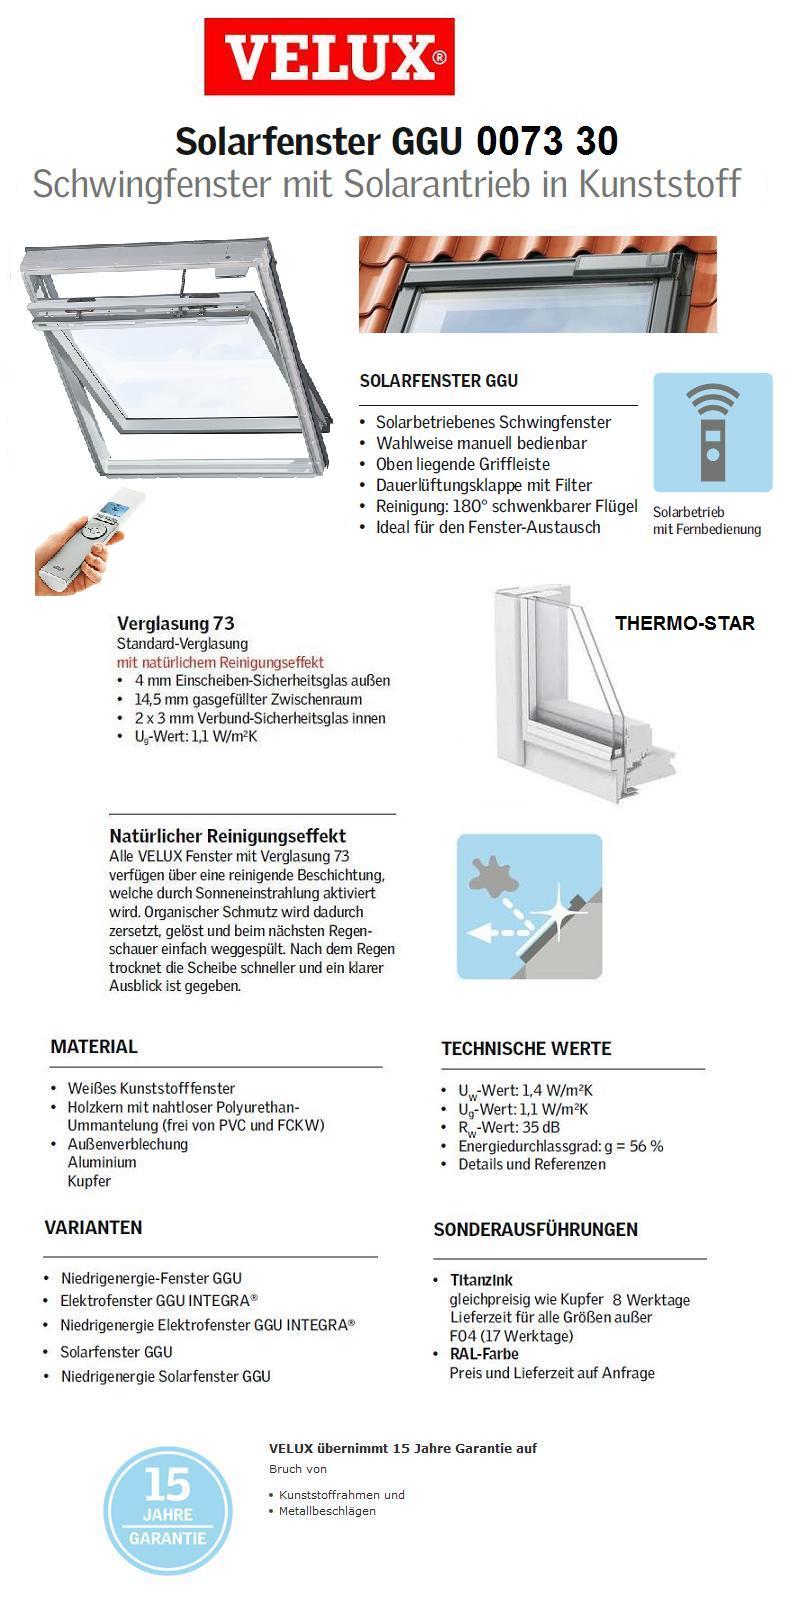 velux solar rollladen velux rollladen solar sst sk08 0000. Black Bedroom Furniture Sets. Home Design Ideas